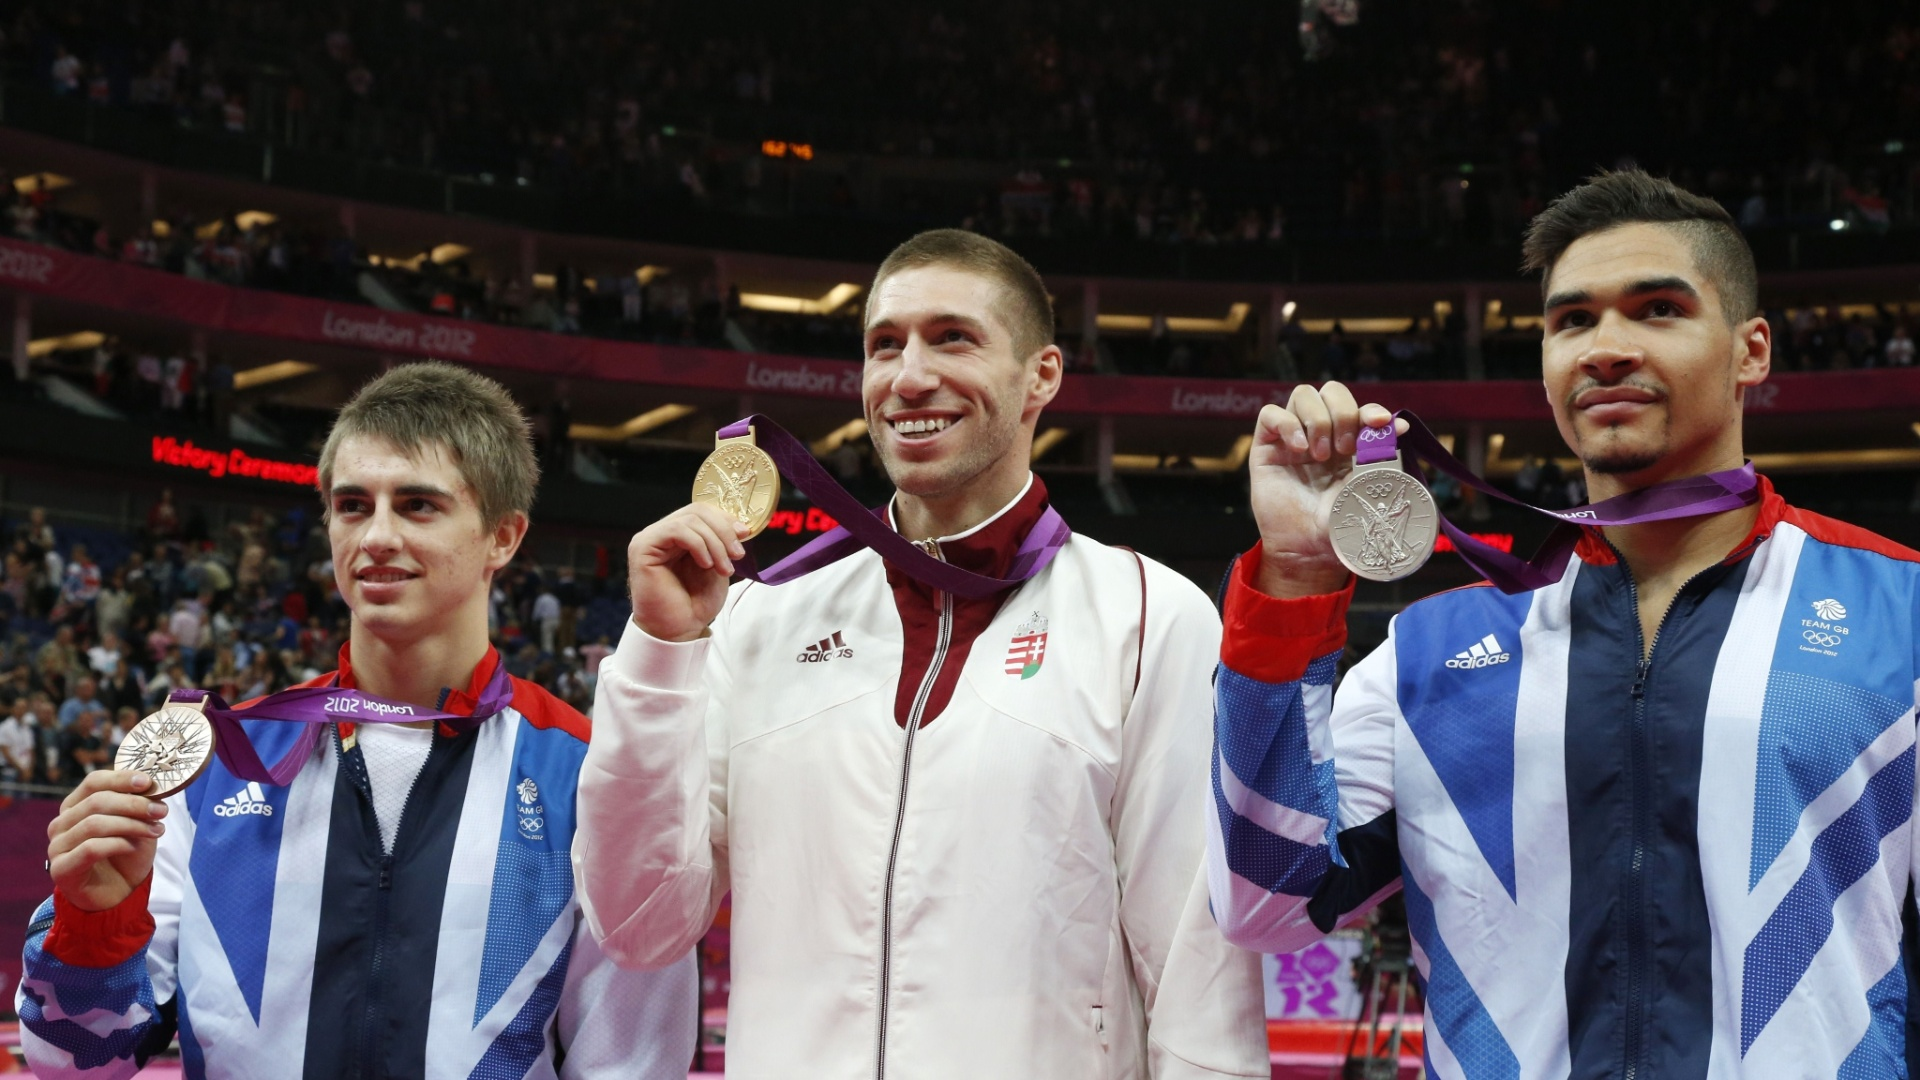 Pódio do cavalo com alças teve Max Whitlock (e), Krisztian Berki (c) e Louis Smith, medalhistas de bronze, ouro e prata, respectivamente